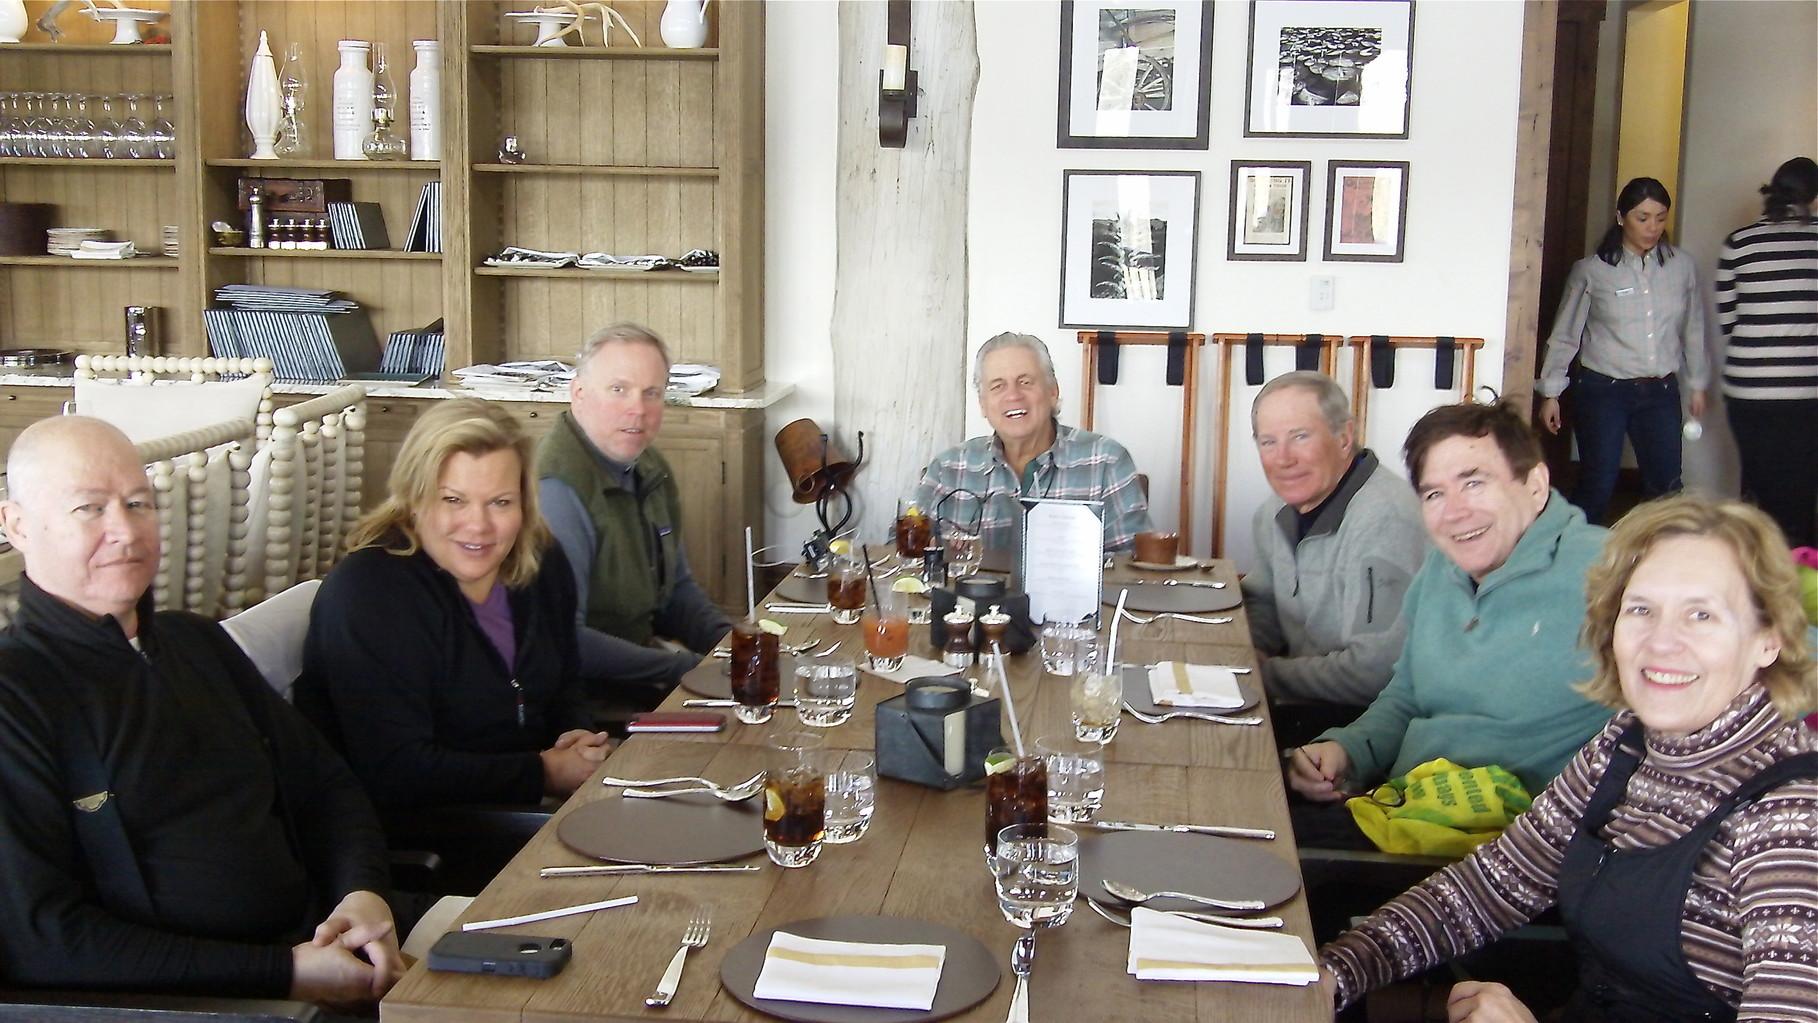 Jack Donohue, Celeste, Stuart Jr., Stuart Sr., Dick Fast, John Wagner, & Lorraine Gudas at lunch Spanish Peaks clubhouse